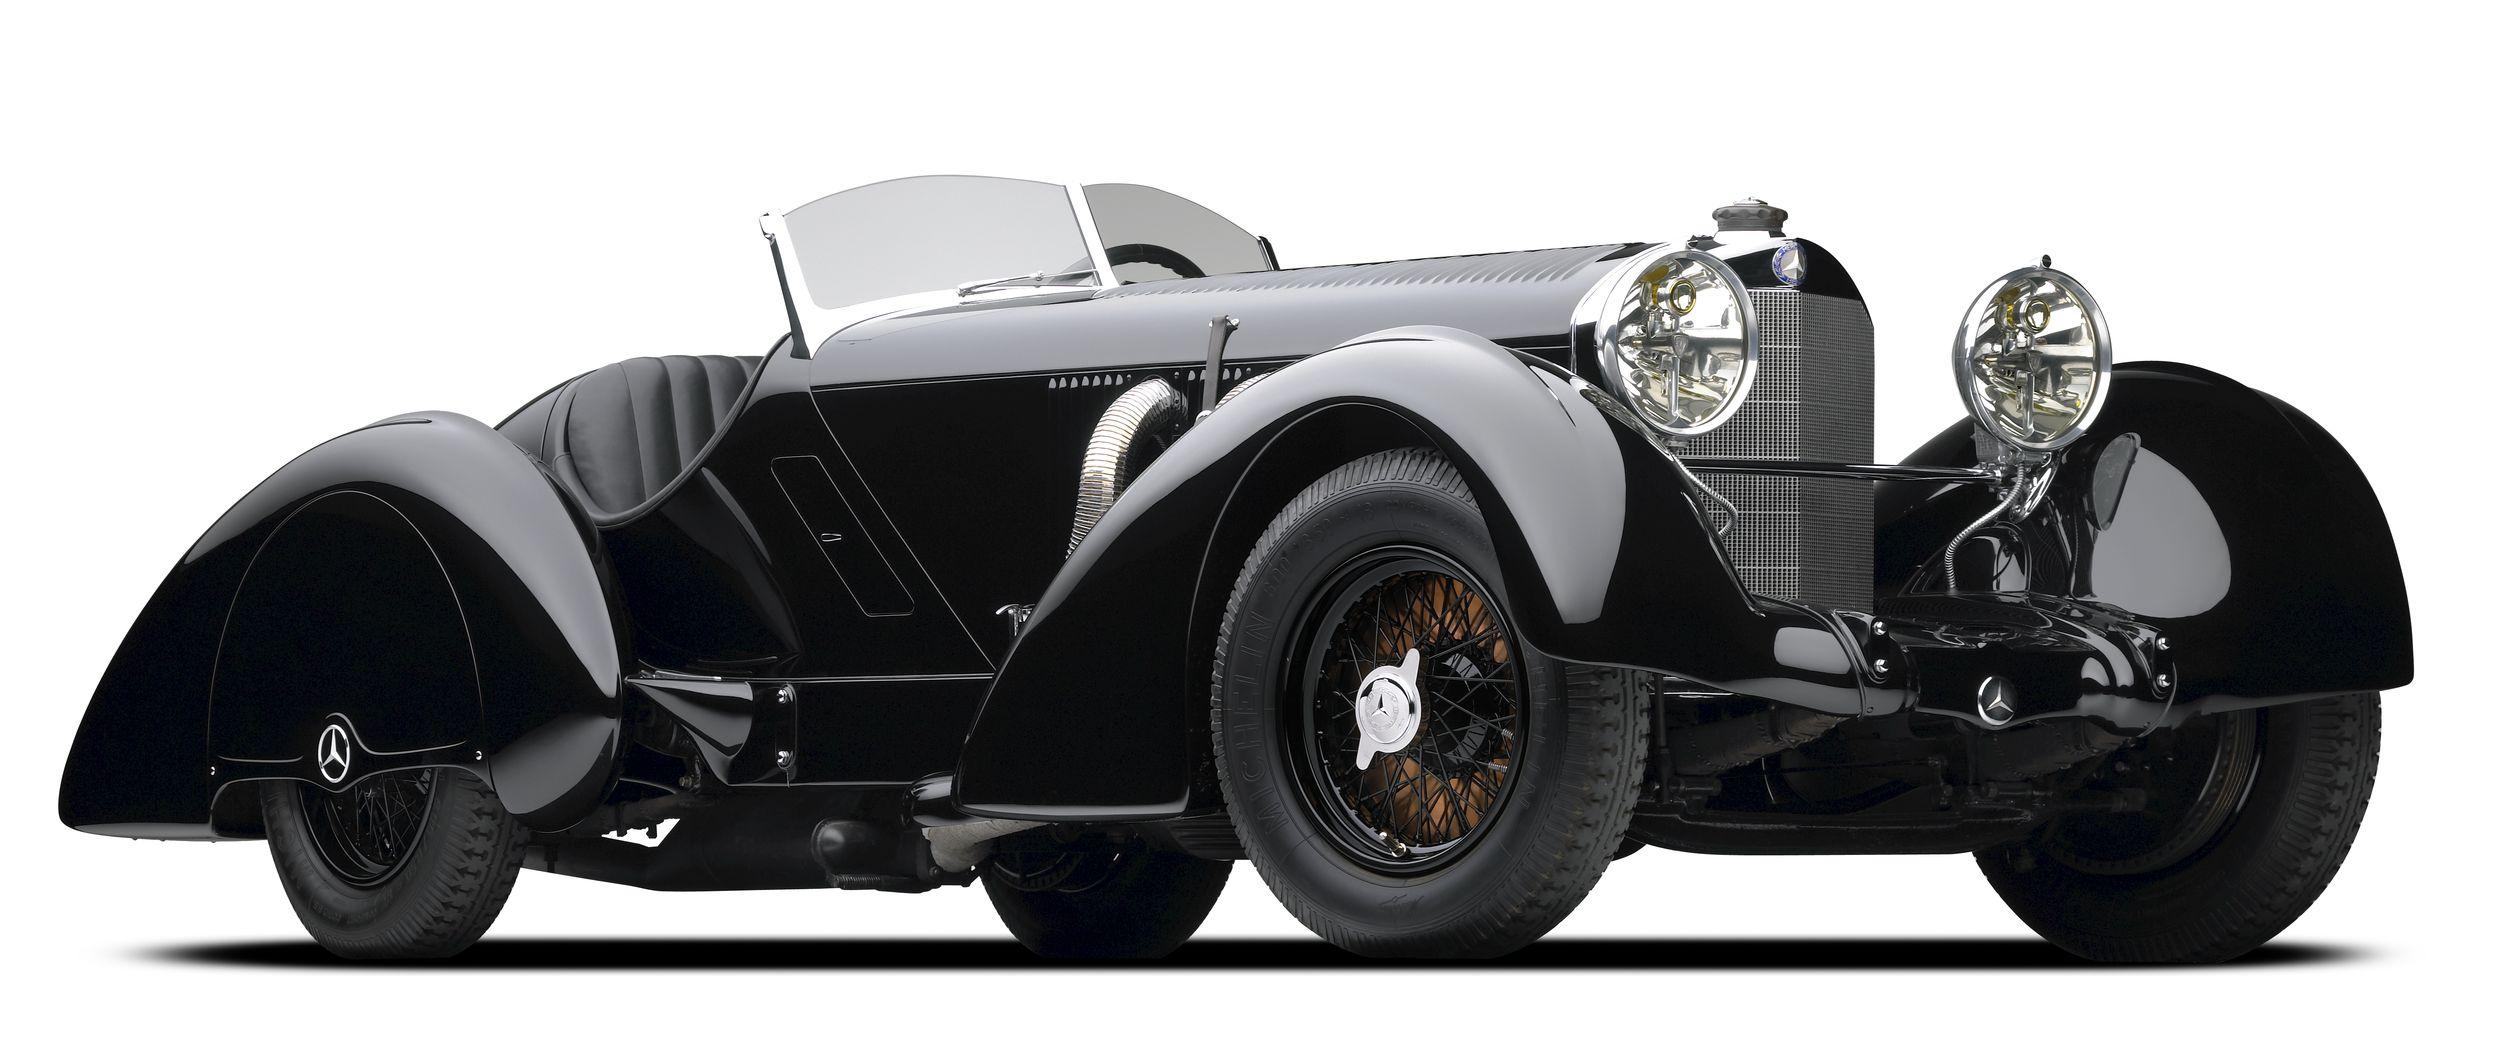 1930-Mercedes-SSK-front-3q.jpg